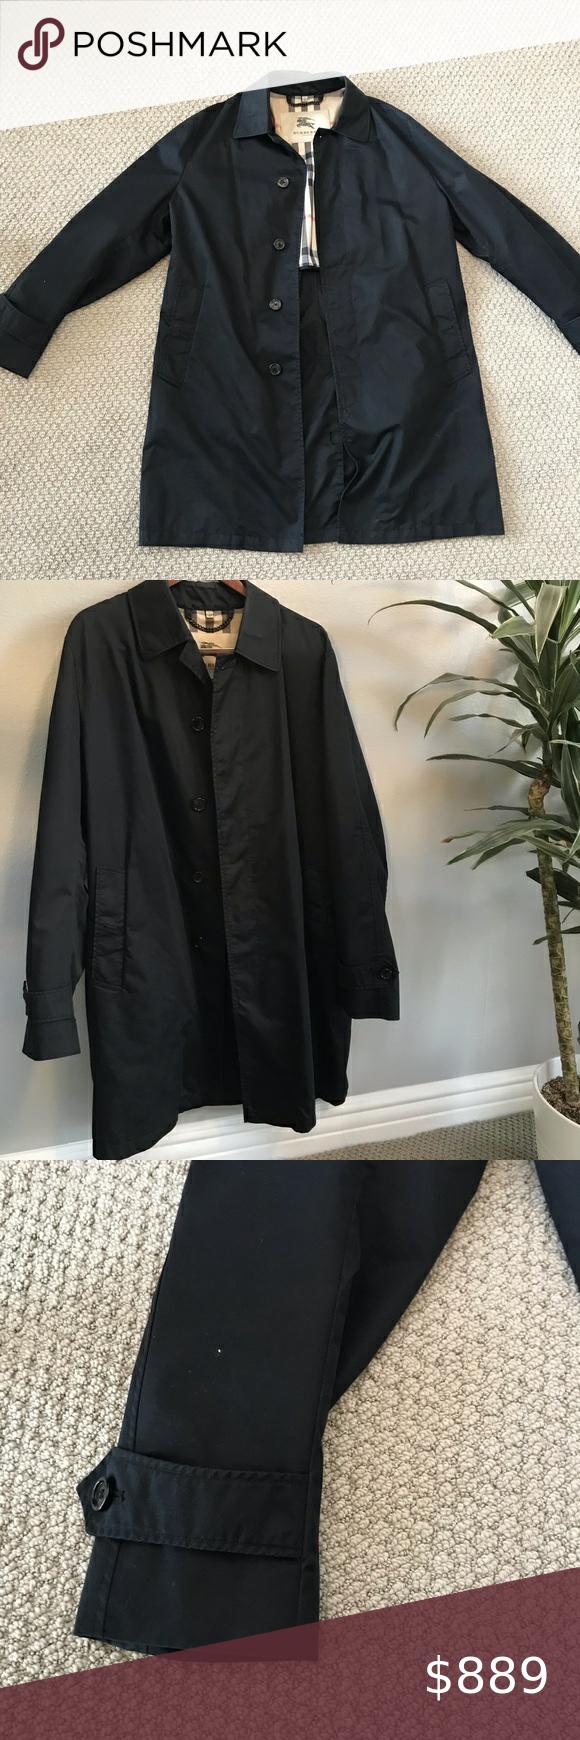 Burberry Black Trench Coat Man Black Trench Coat Men Trench Coat Men Men S Trench Coat